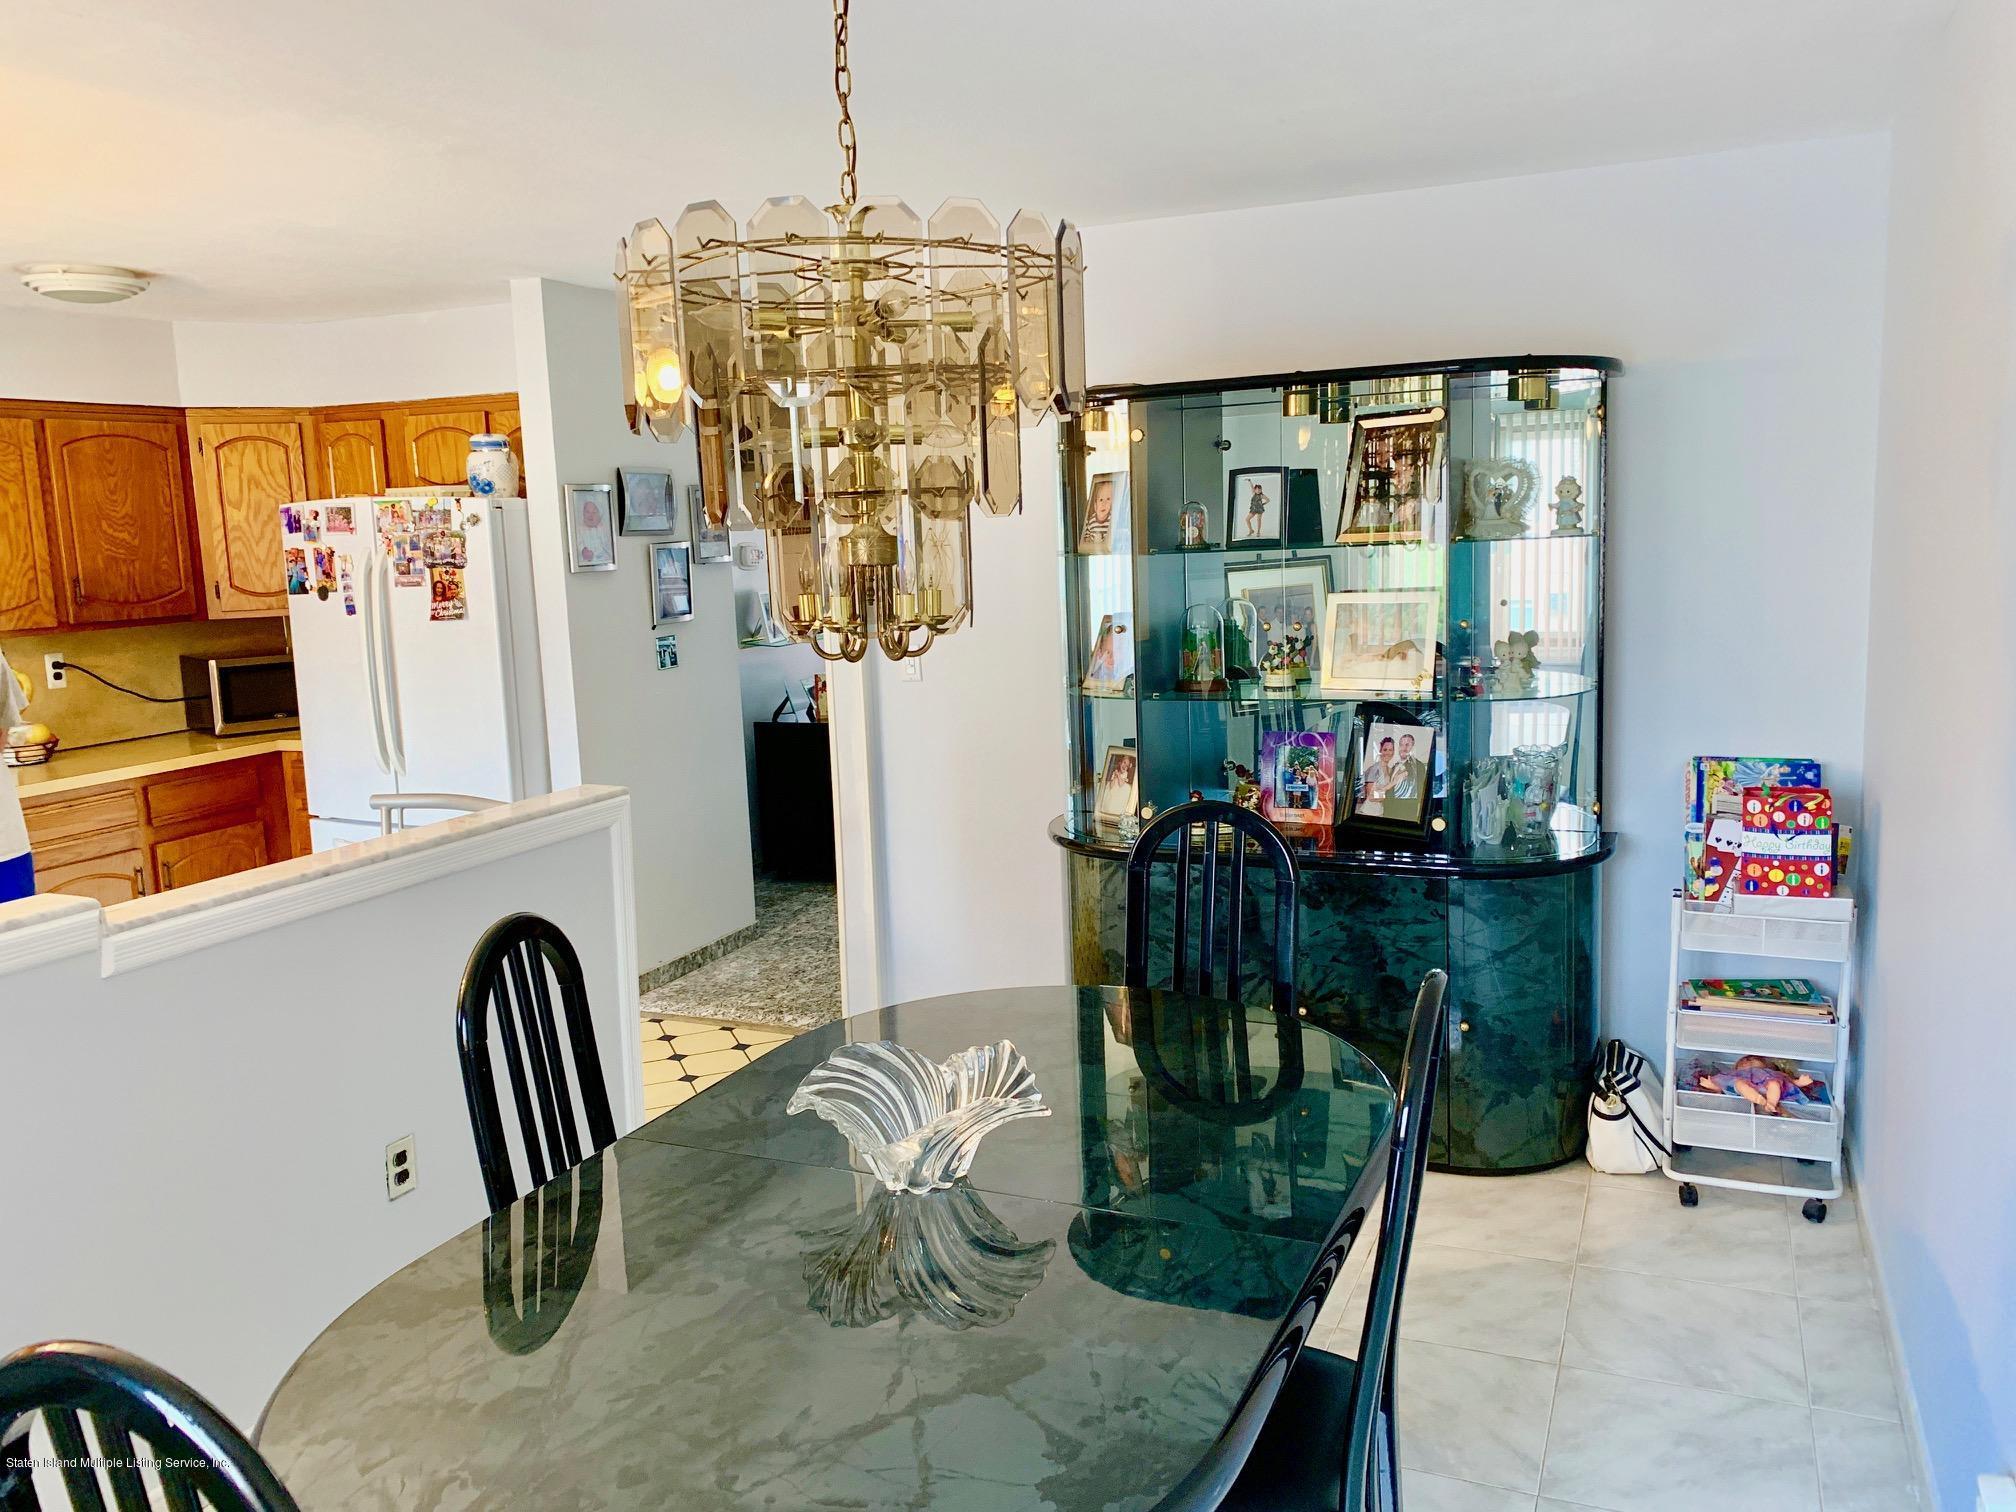 Single Family - Attached 99 Cedar Grove   Staten Island, NY 10306, MLS-1132231-2